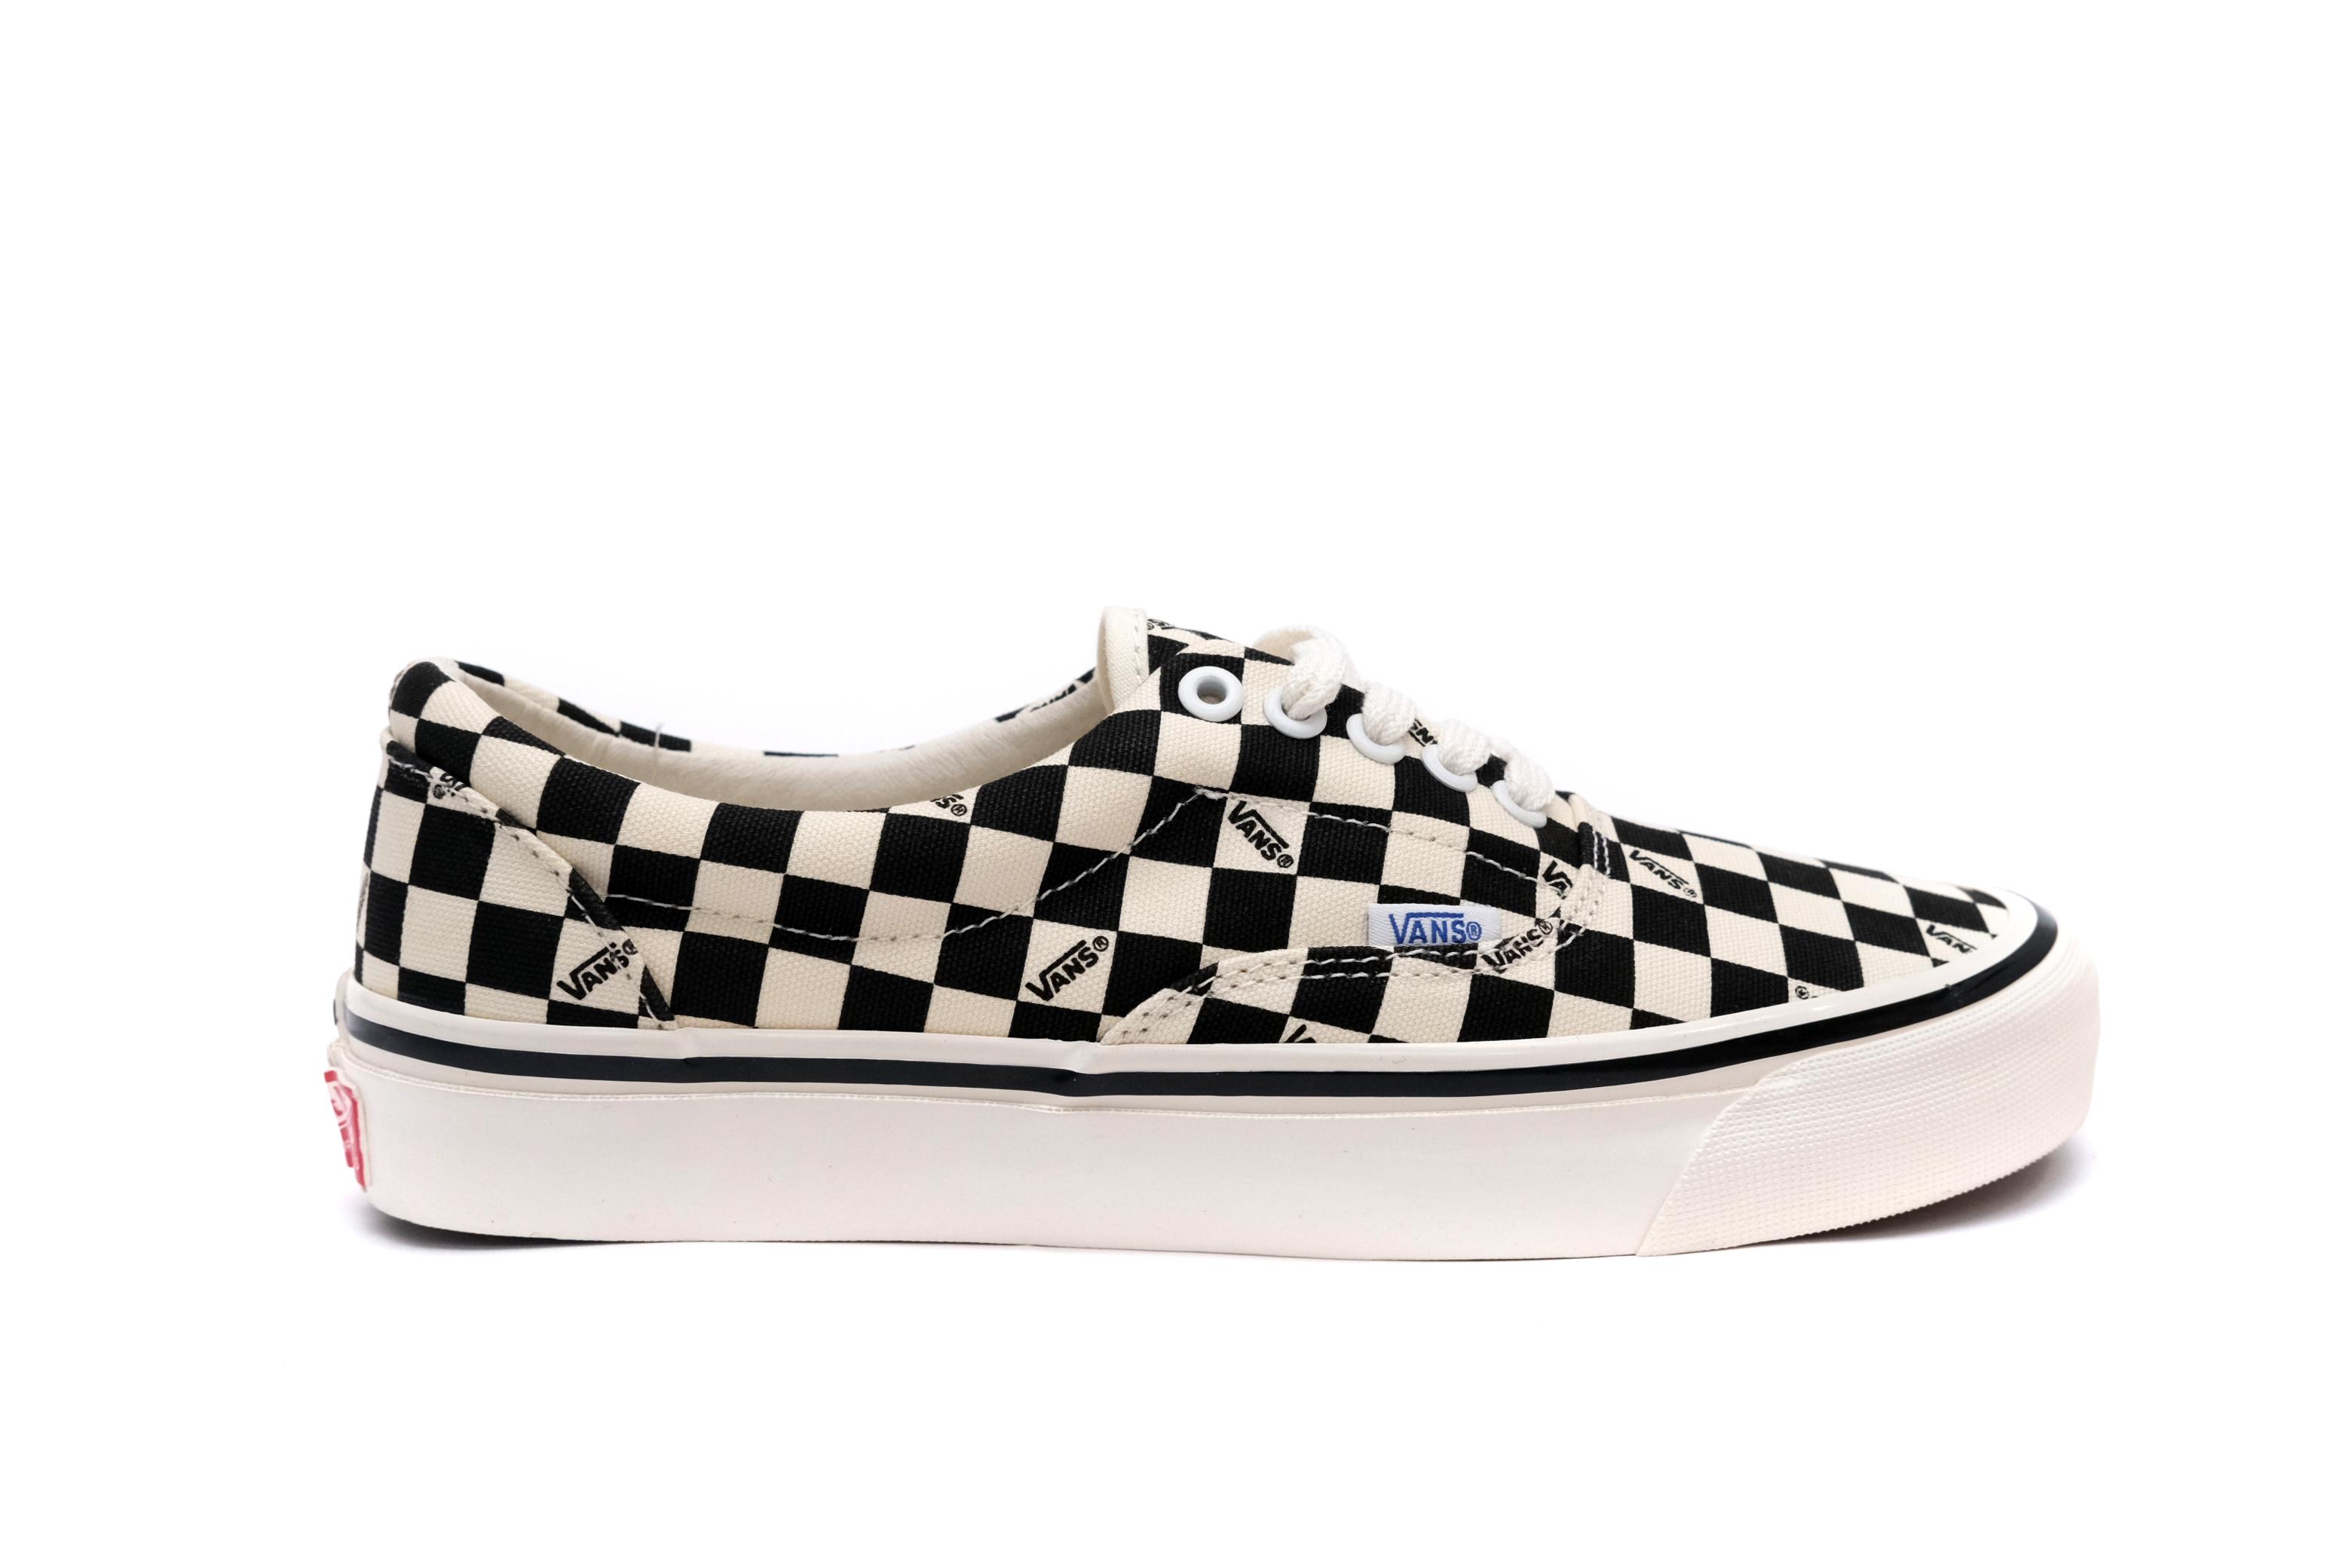 Vans Era Checkerboard 2020